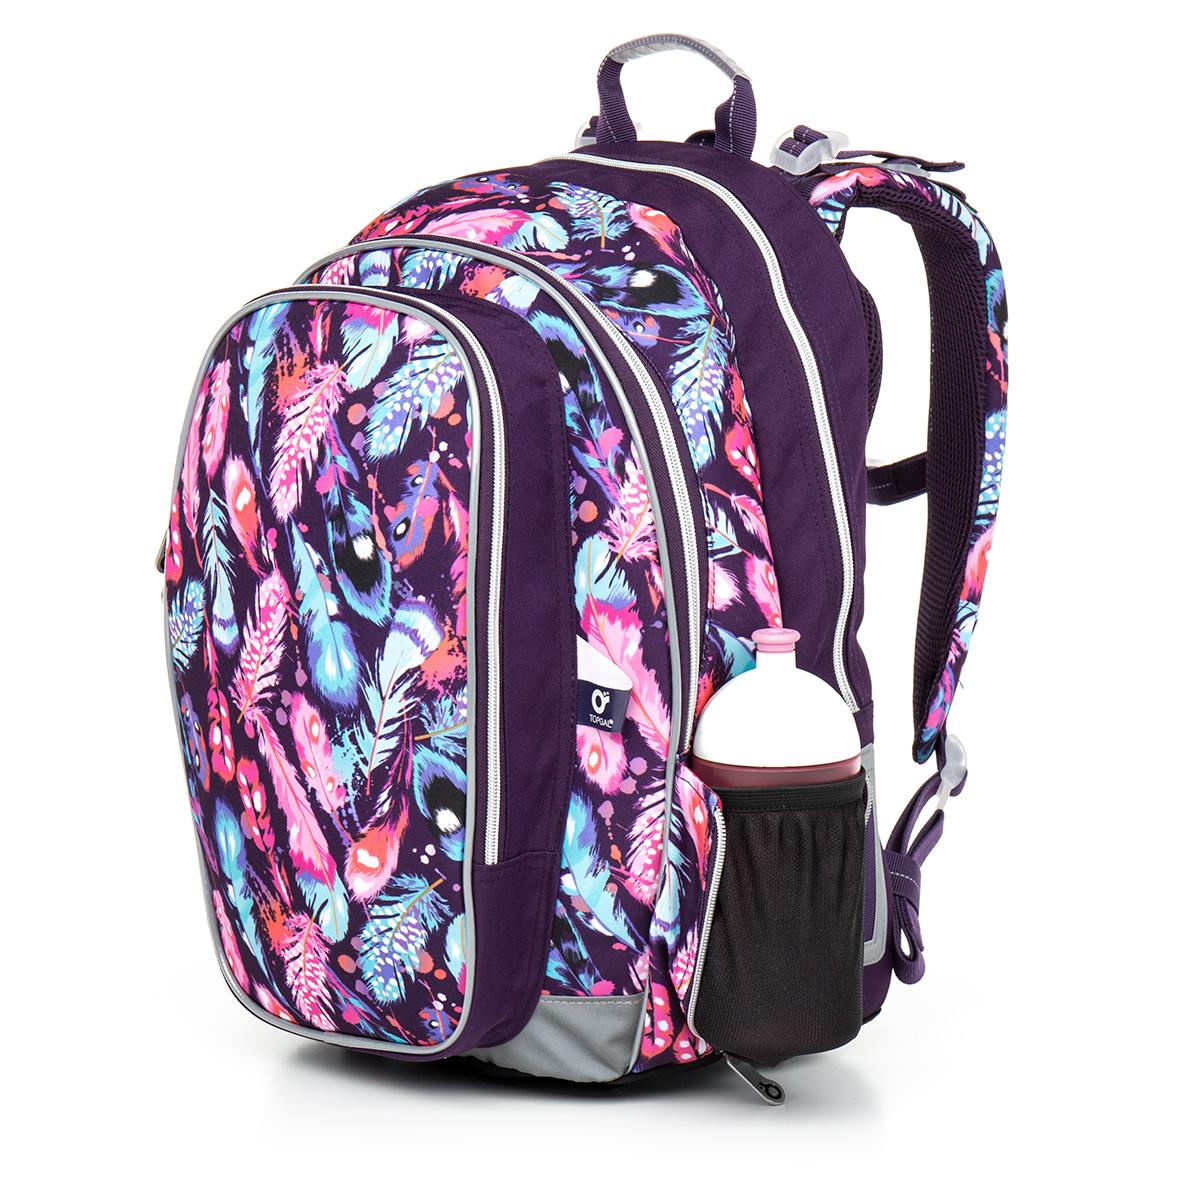 d8f32e609d5 Školní batoh Topgal CHI 796 - H Pink Peříčka